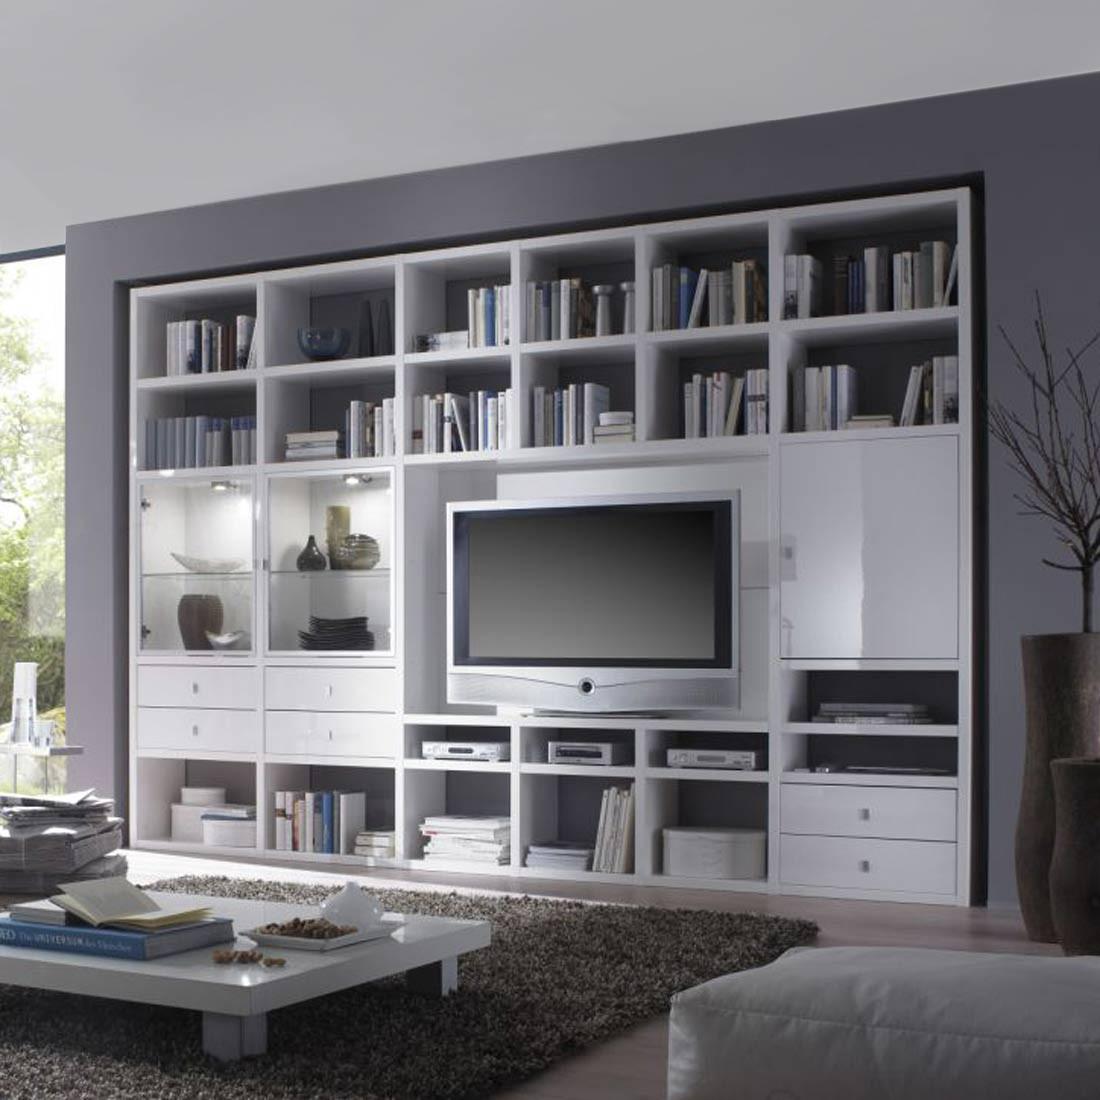 wohnwand empire wei hochglanz ohne beleuchtung. Black Bedroom Furniture Sets. Home Design Ideas